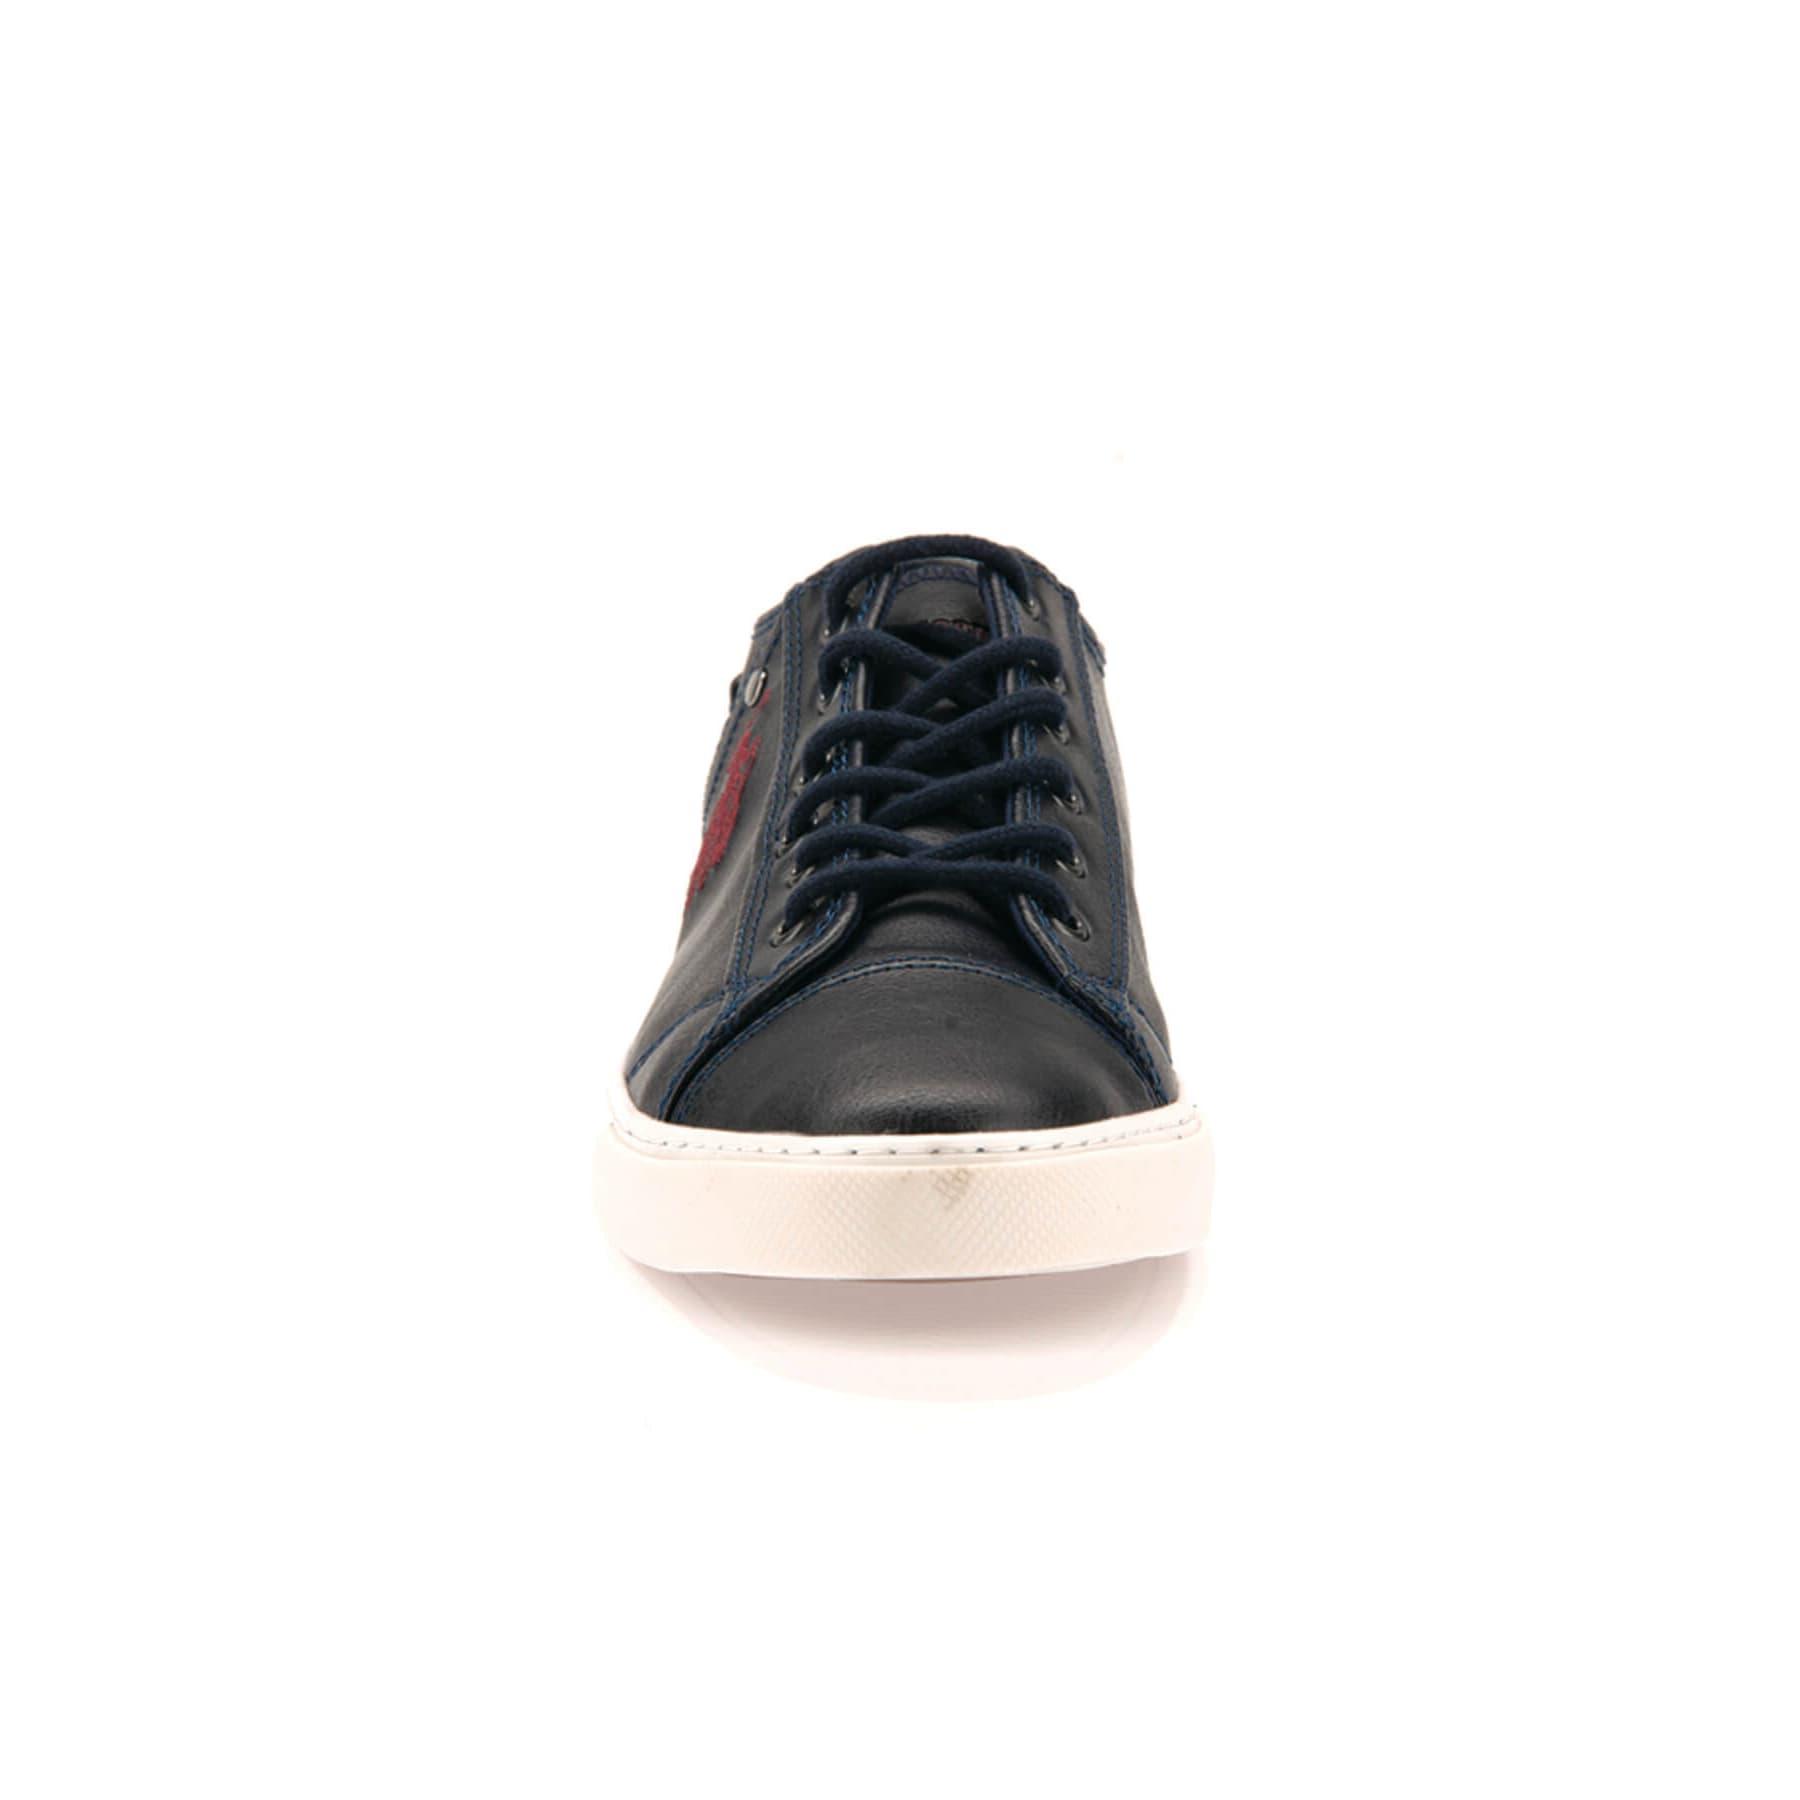 Chat Wt Lacivert Erkek Ayakkabı